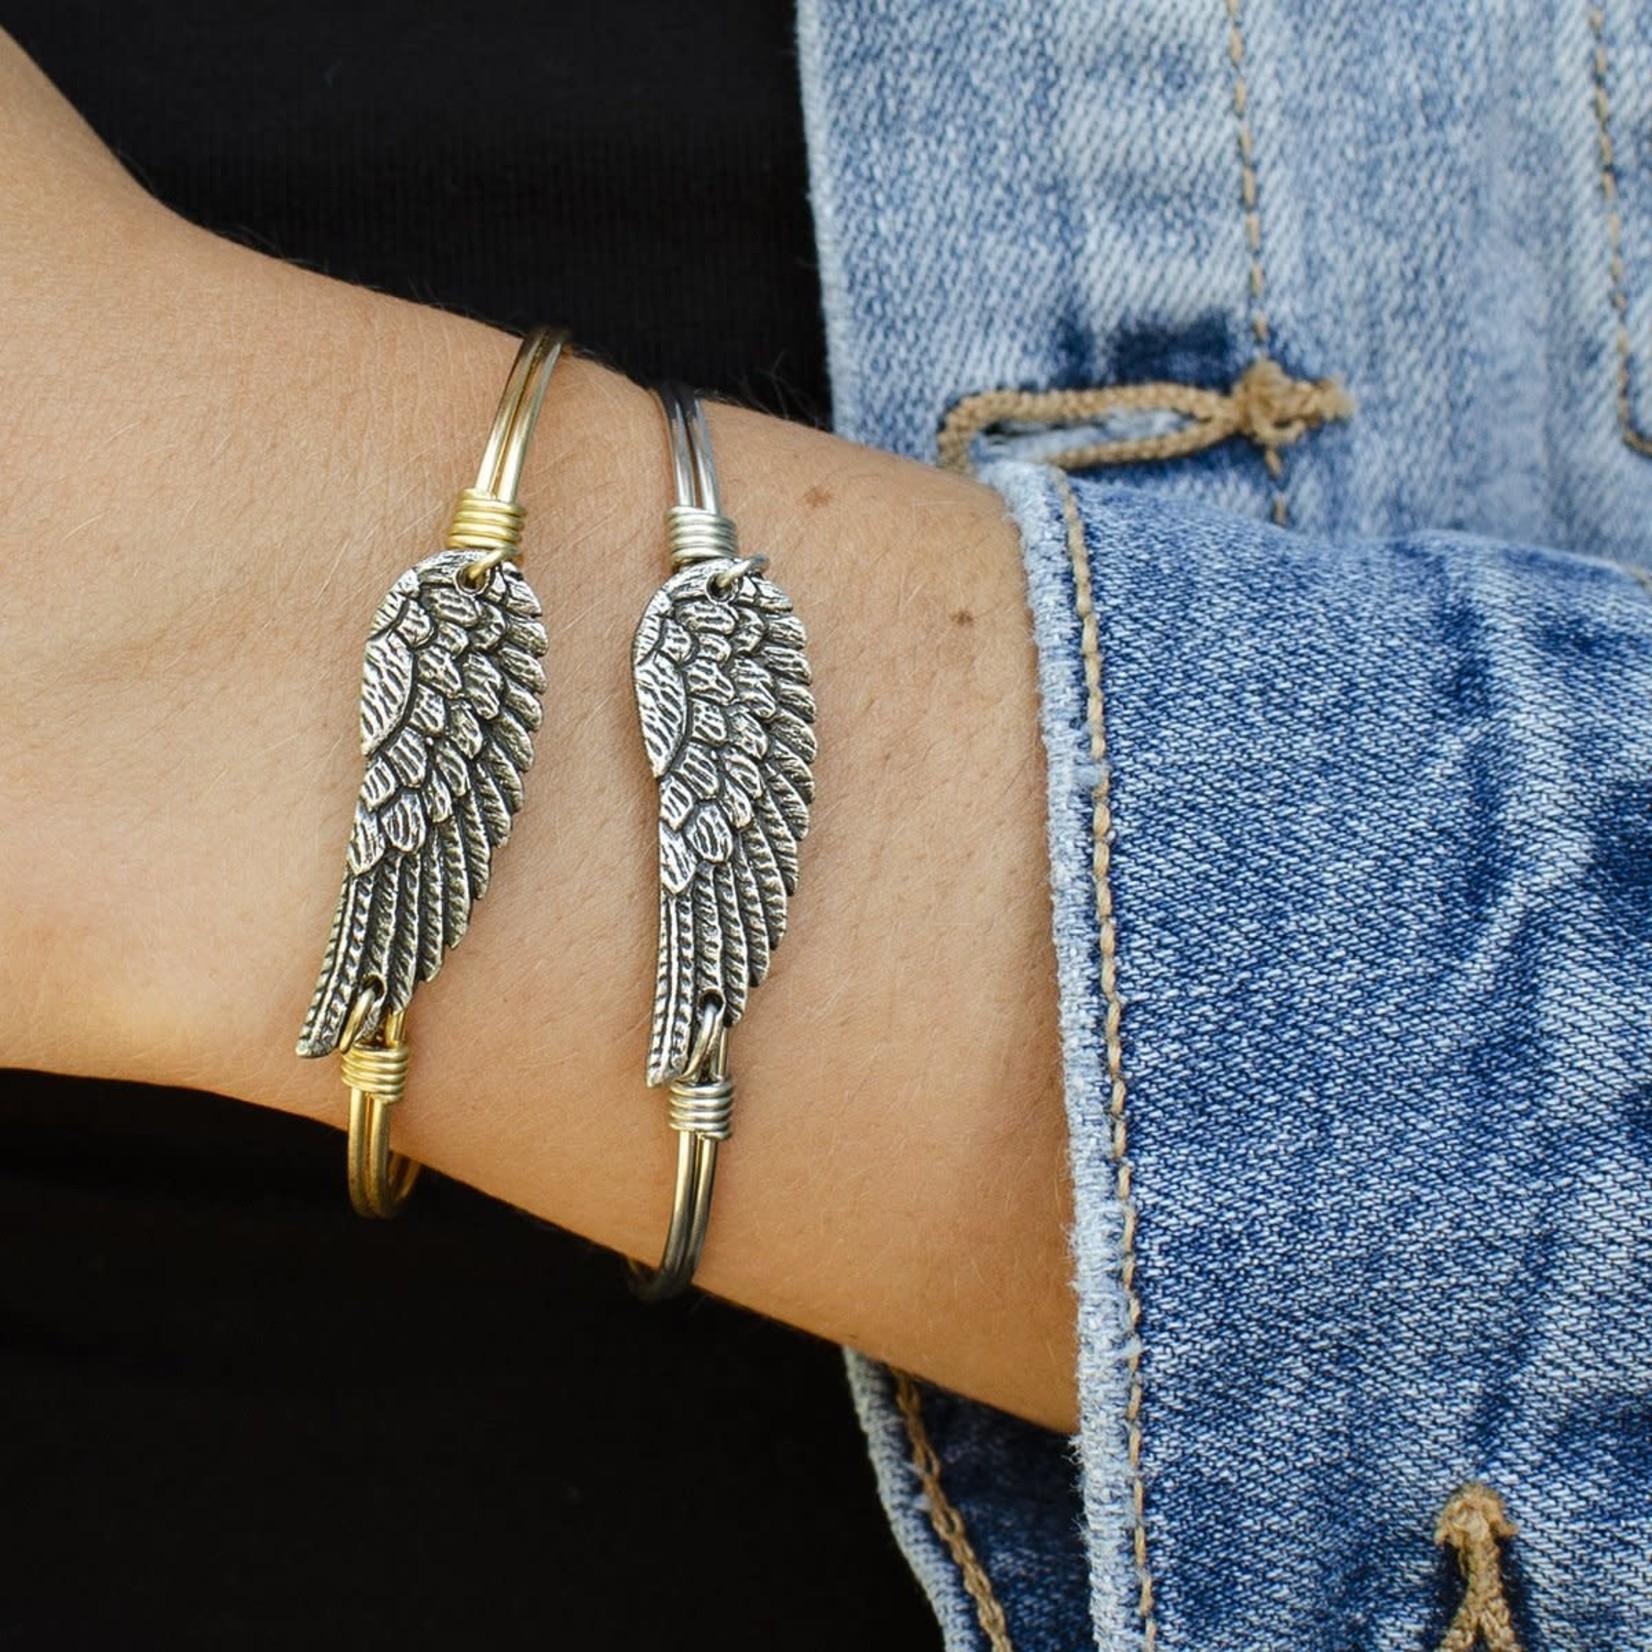 Luca+Danni Angel Wing Bangle Bracelet in Silver Tone/Regular